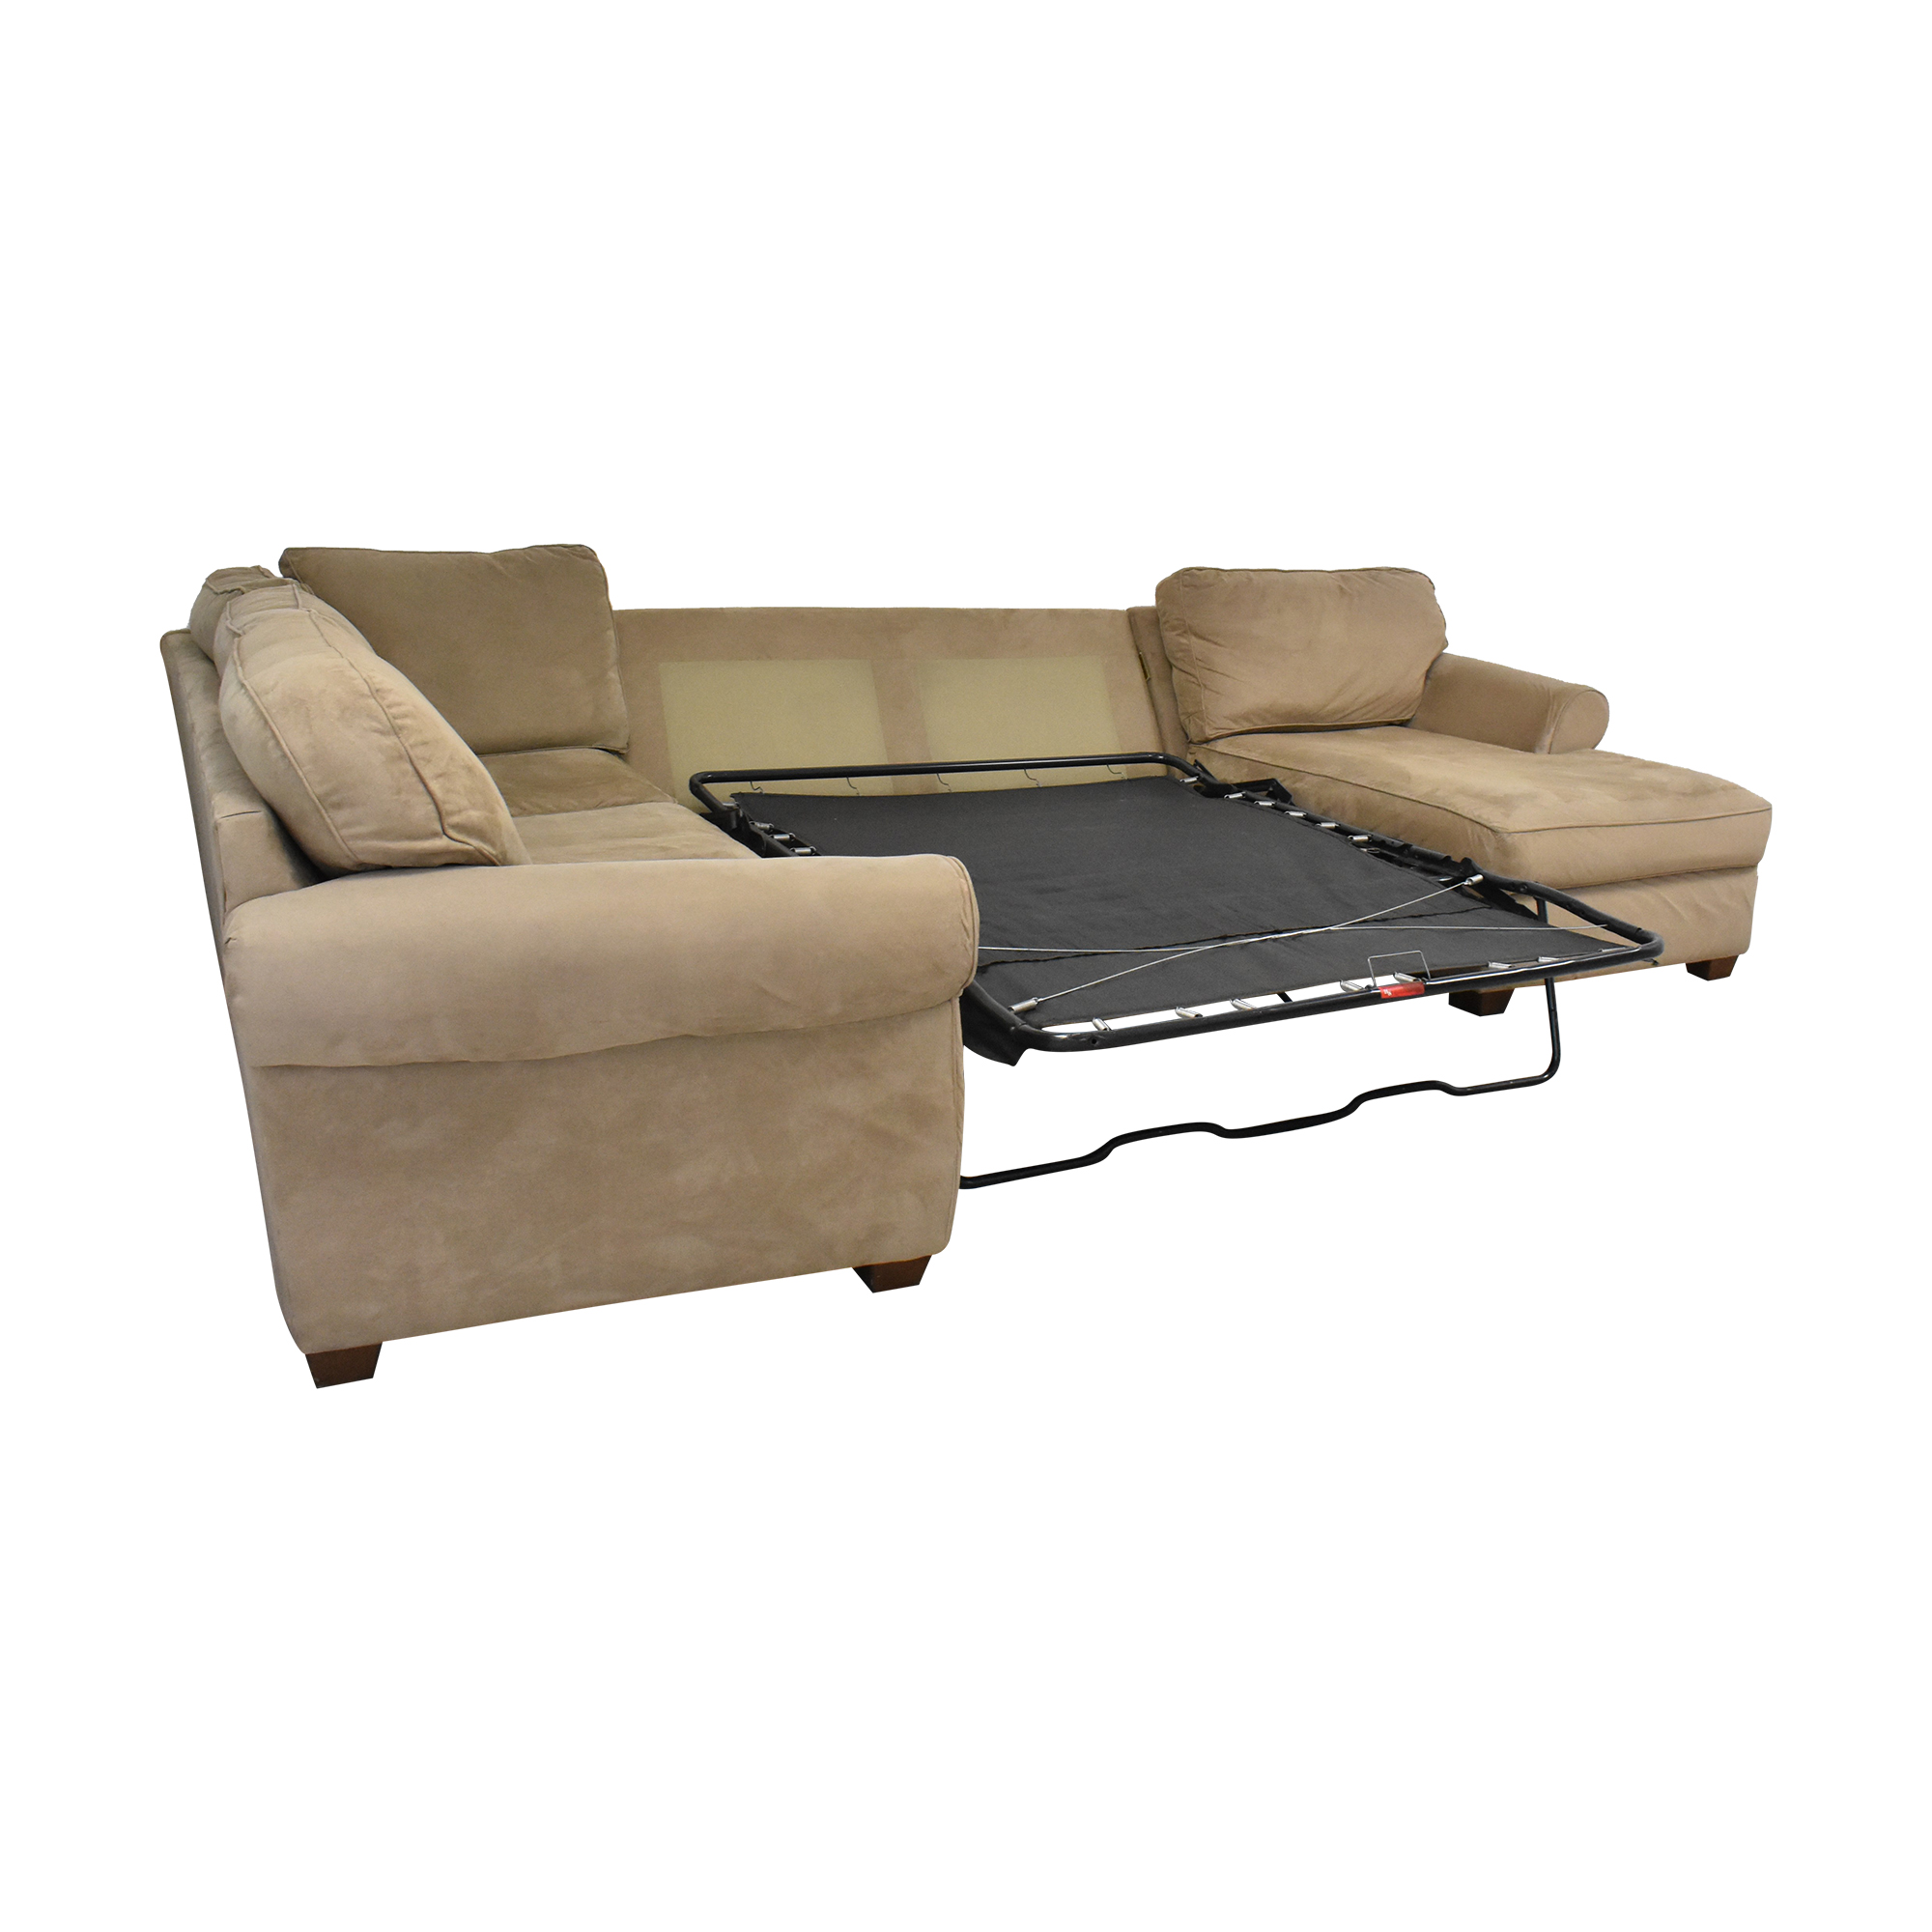 Macy's Chaise Sectional Sleeper Sofa with Ottoman Macy's